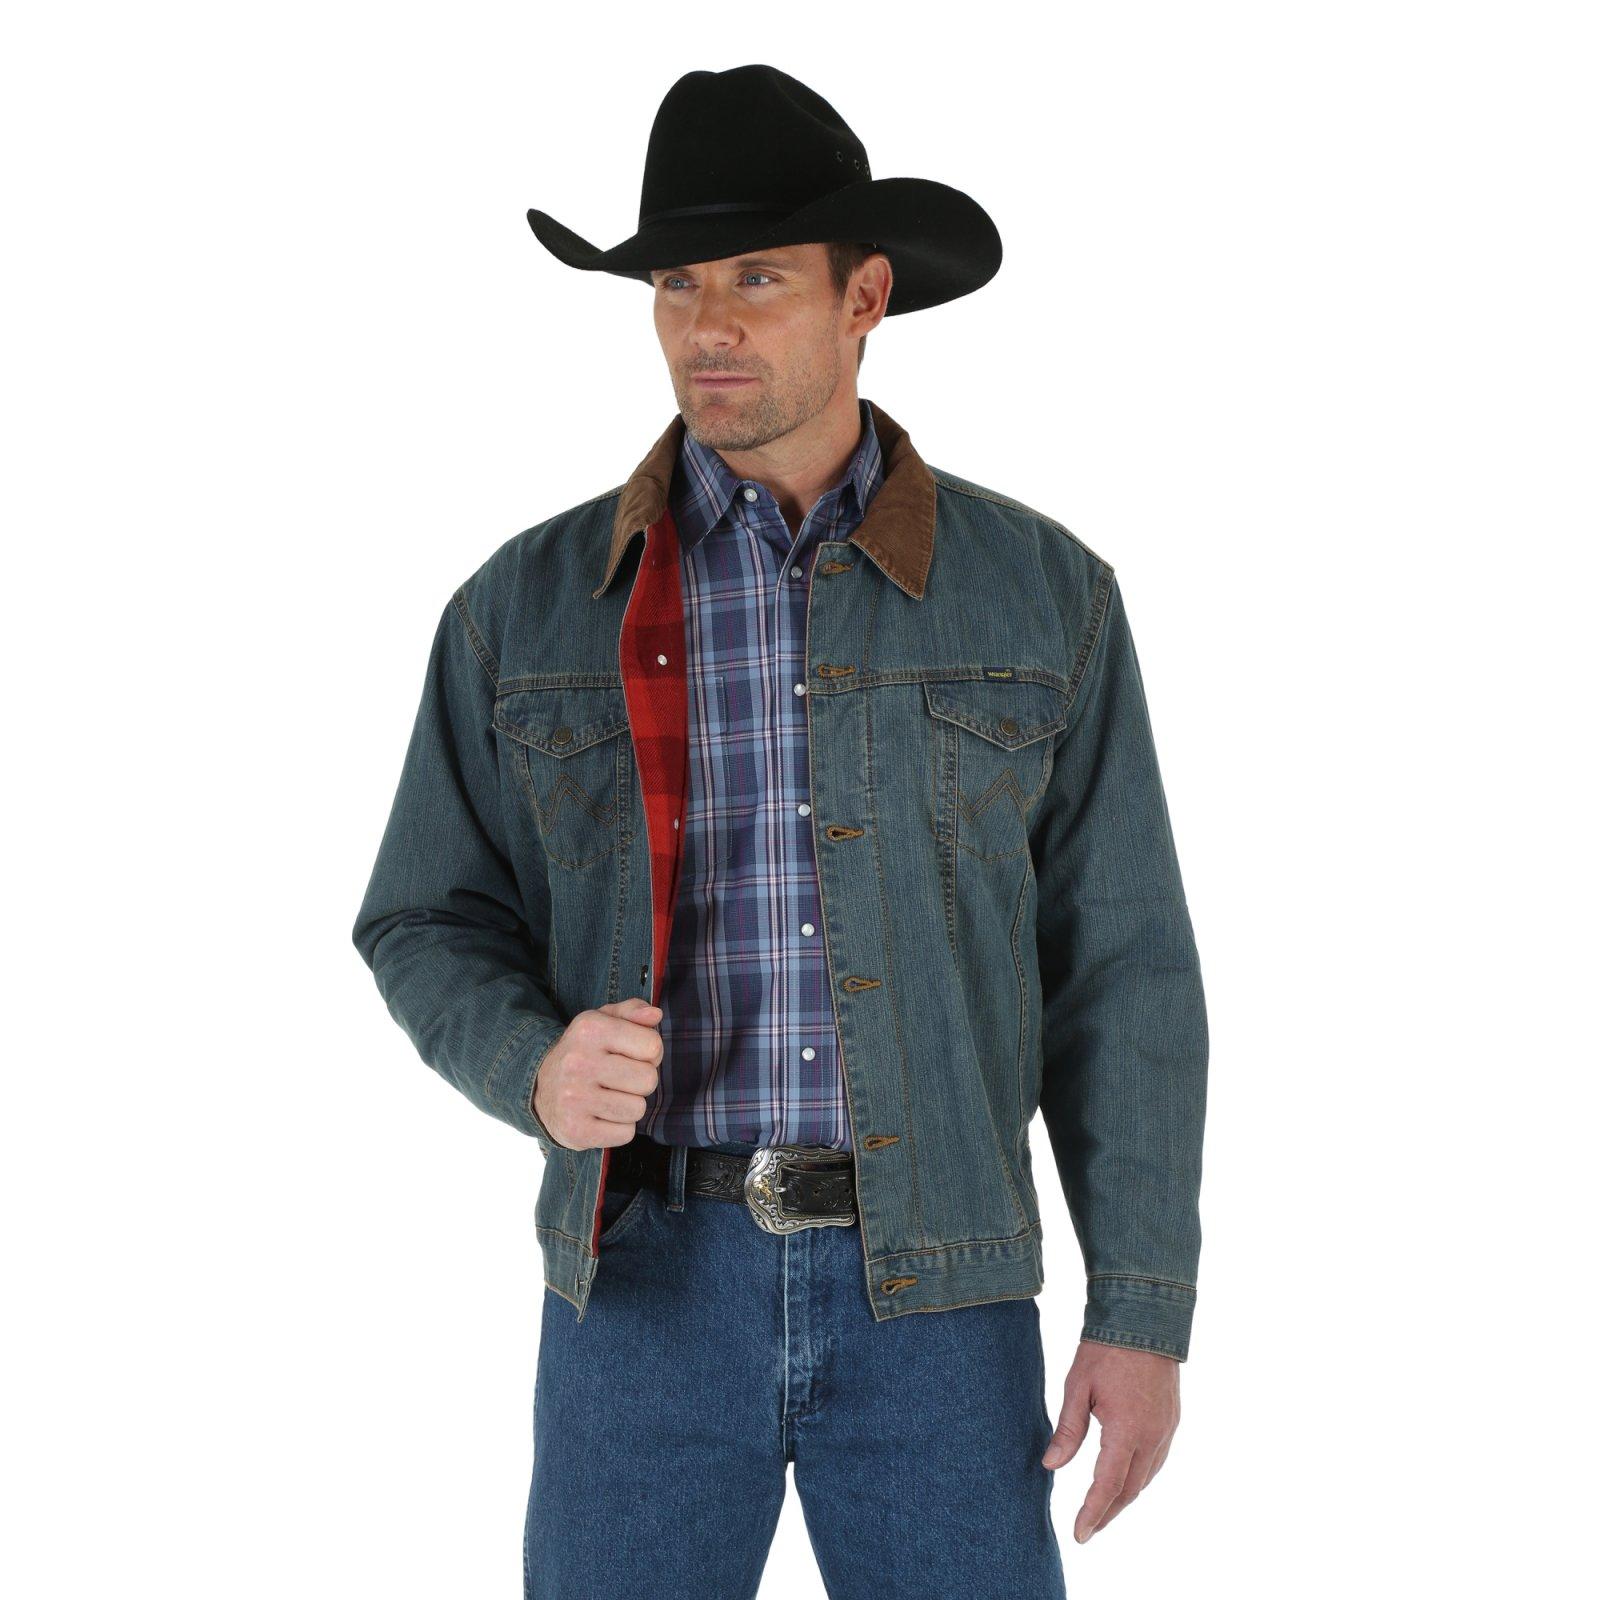 Cowboy Cut Denim Jacket from Wrangler